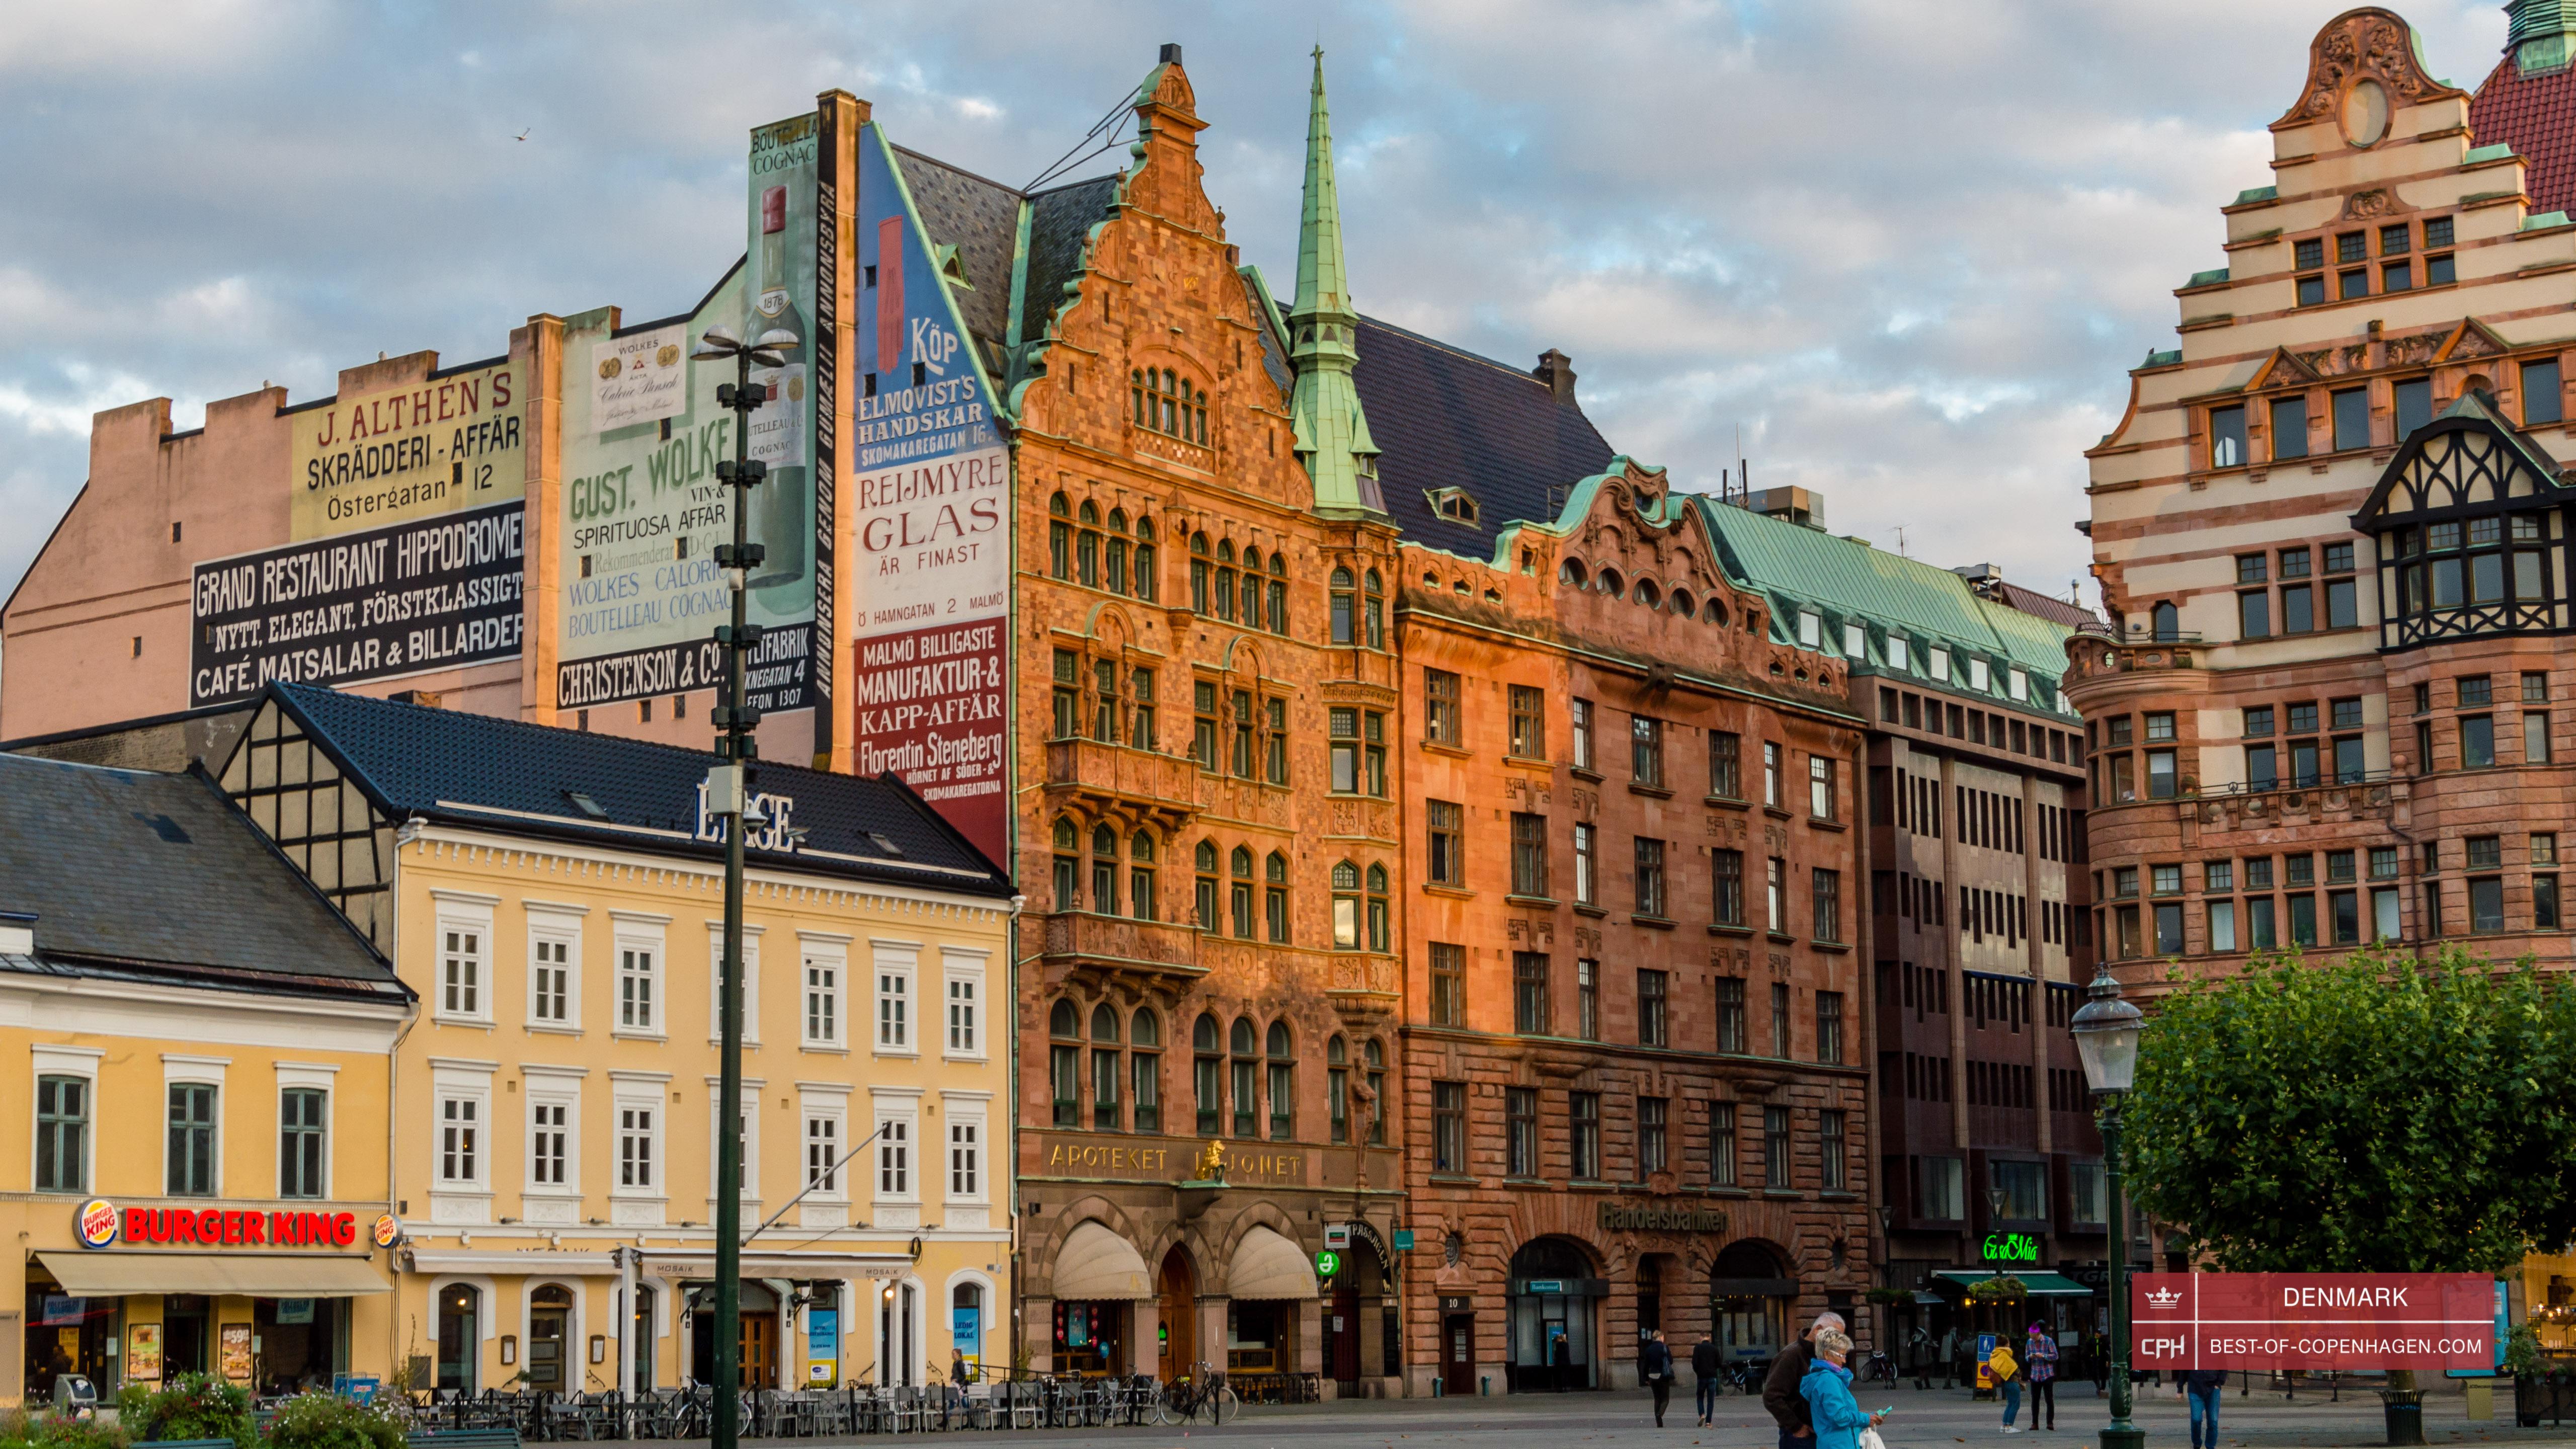 The Grand Hotel Copenhagen